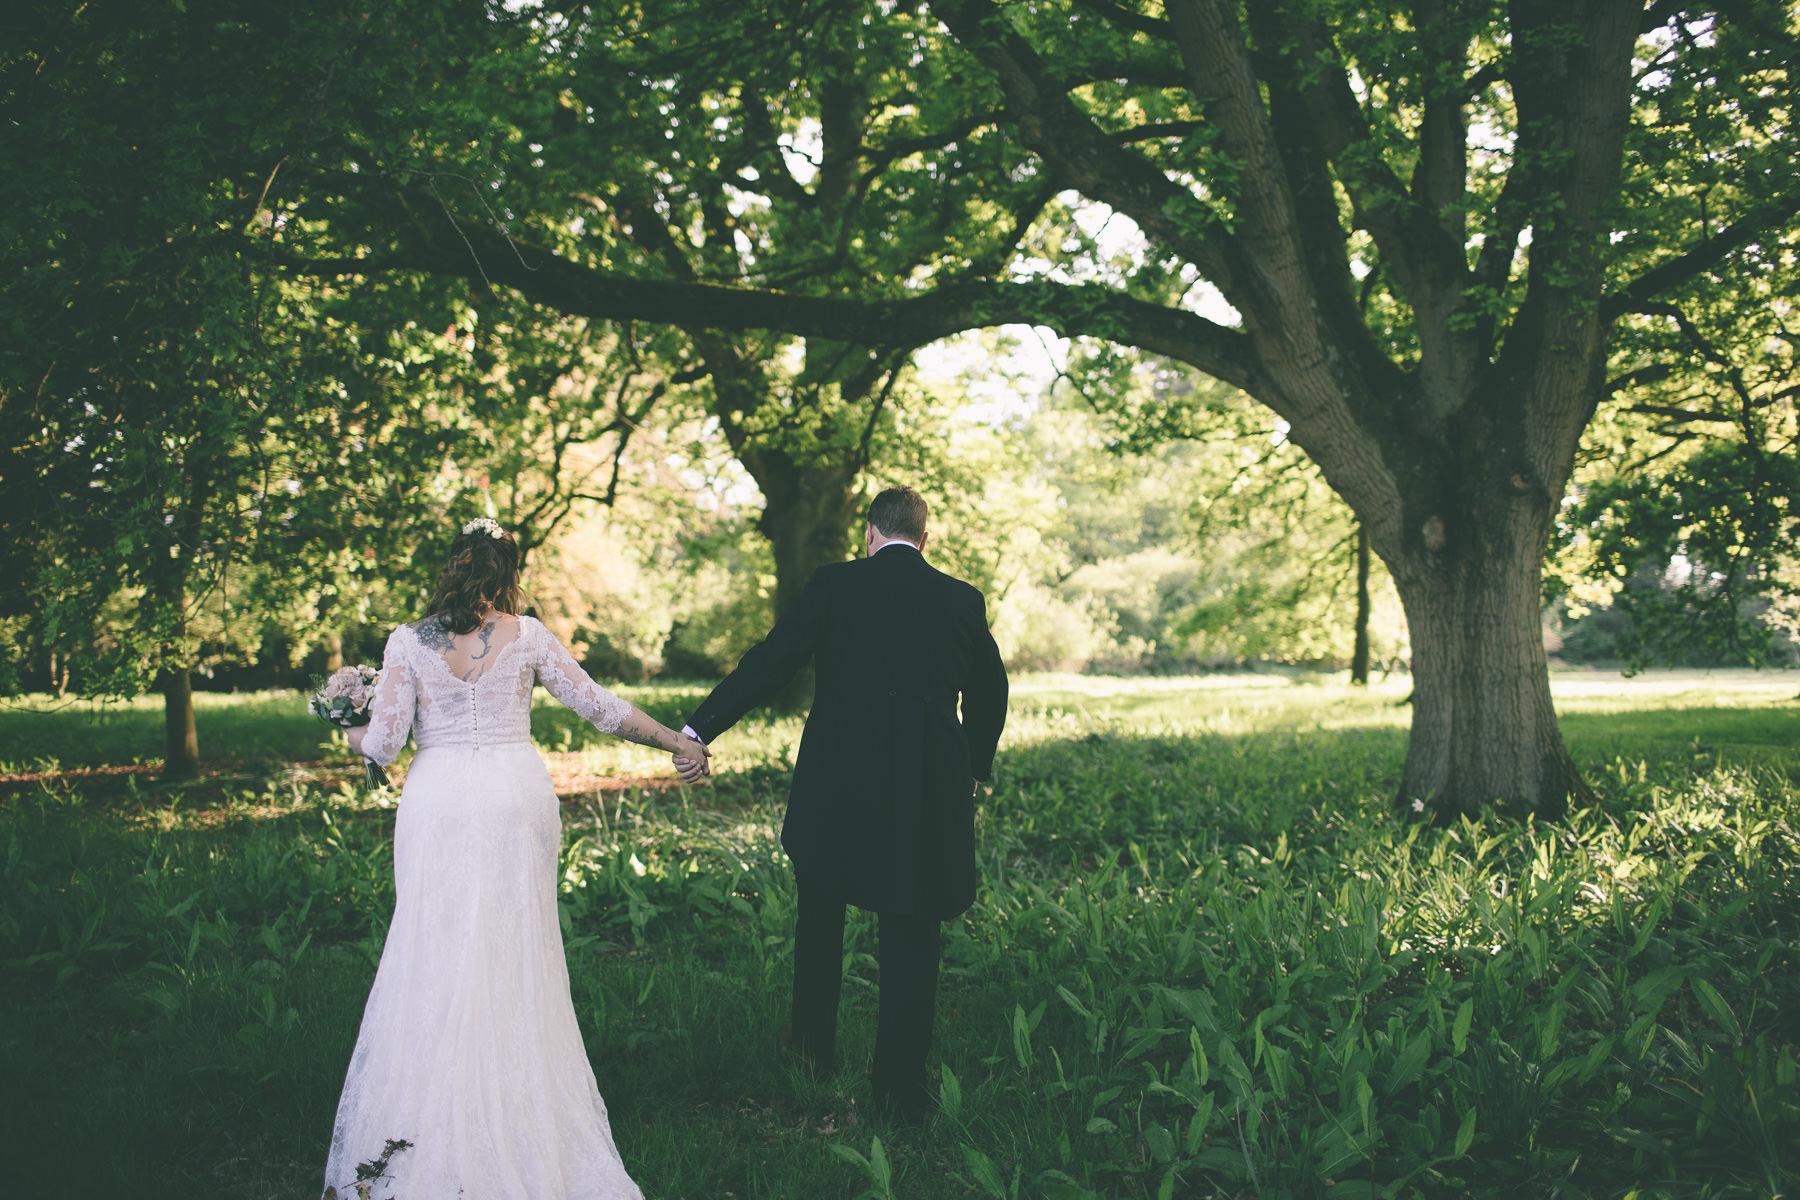 Pamber-Place-wedding-photography-basingstoke-hampshire-181